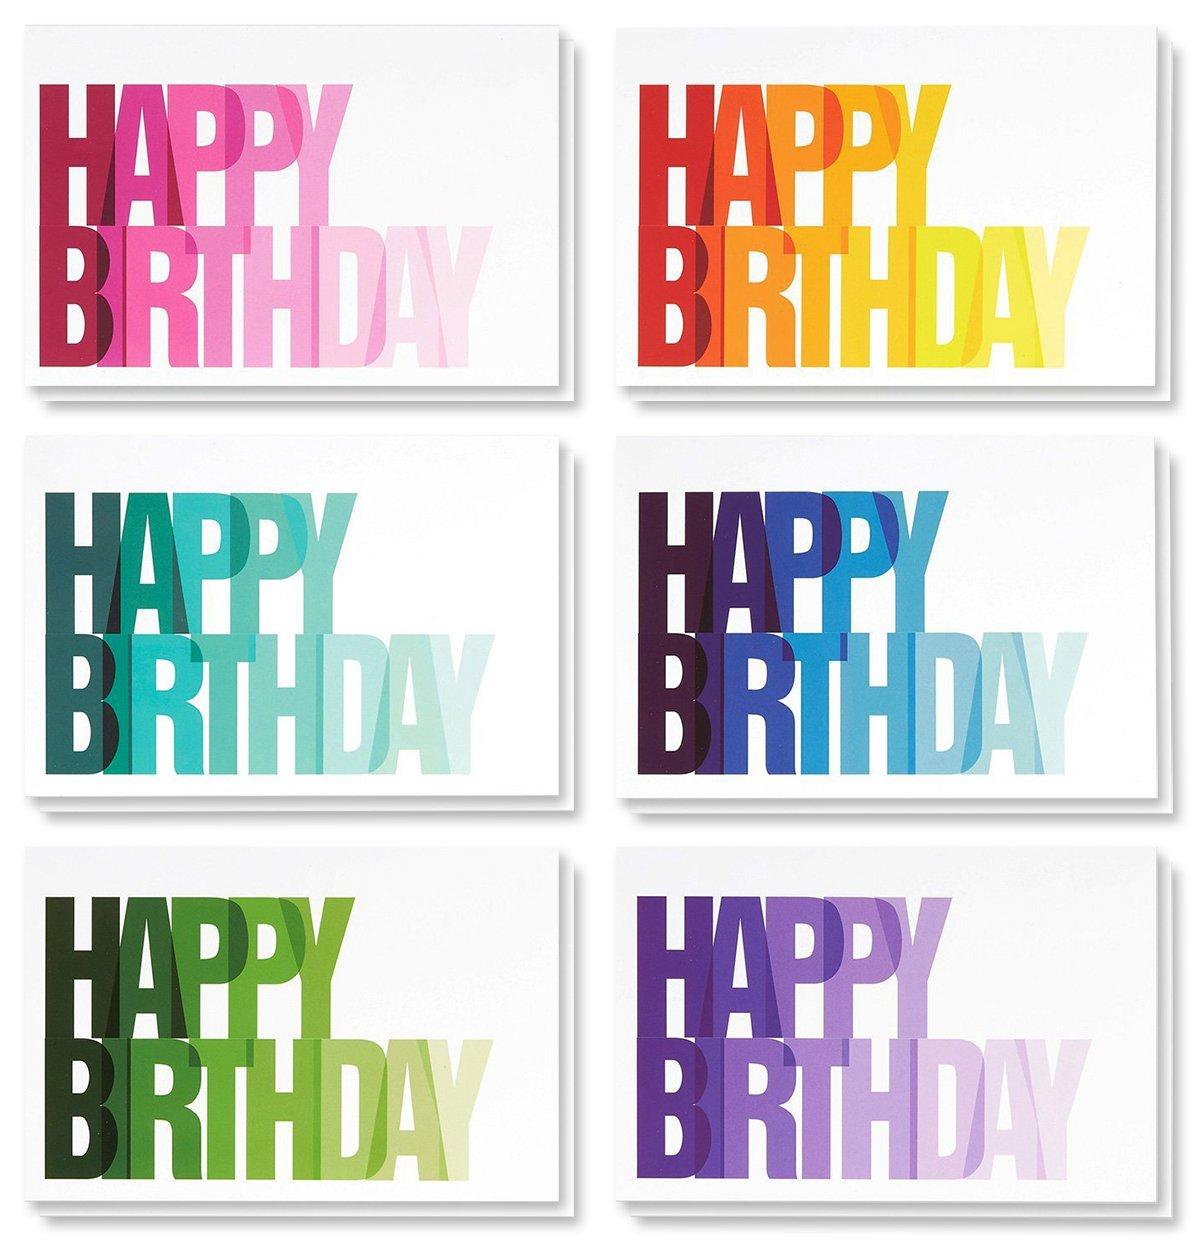 36-Pack Birthday Cards Box Set